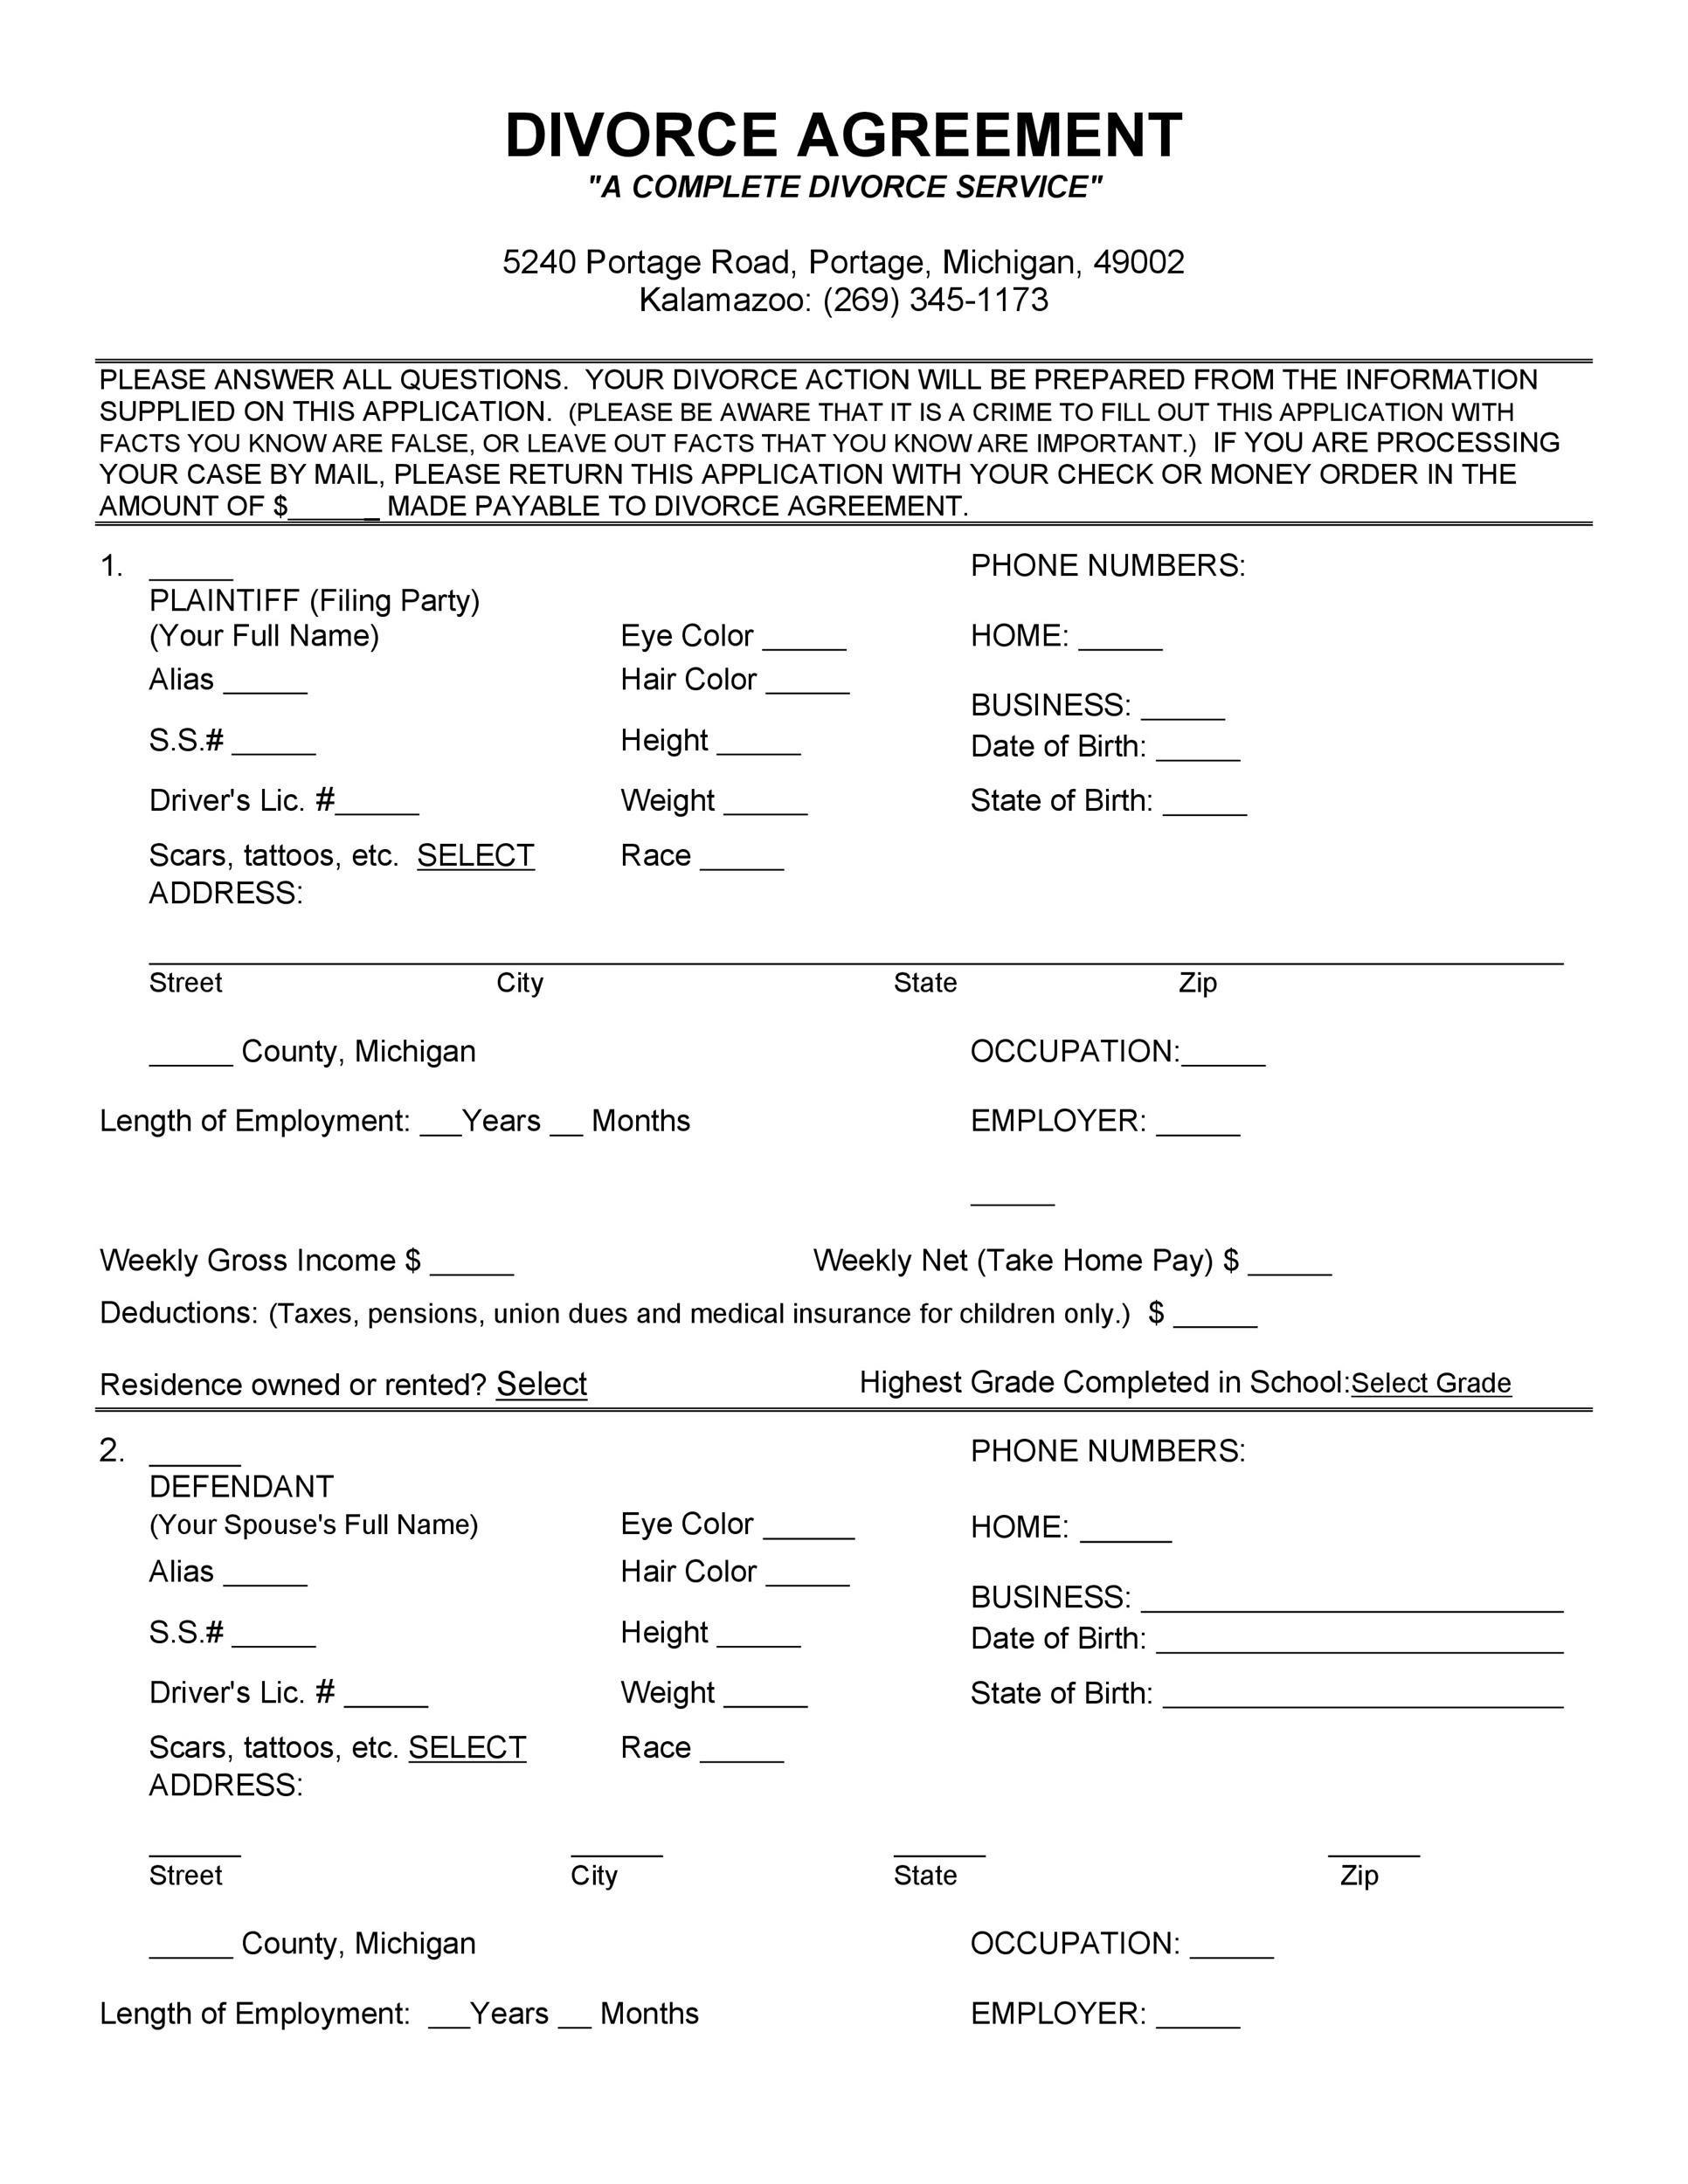 Free divorce agreement 02